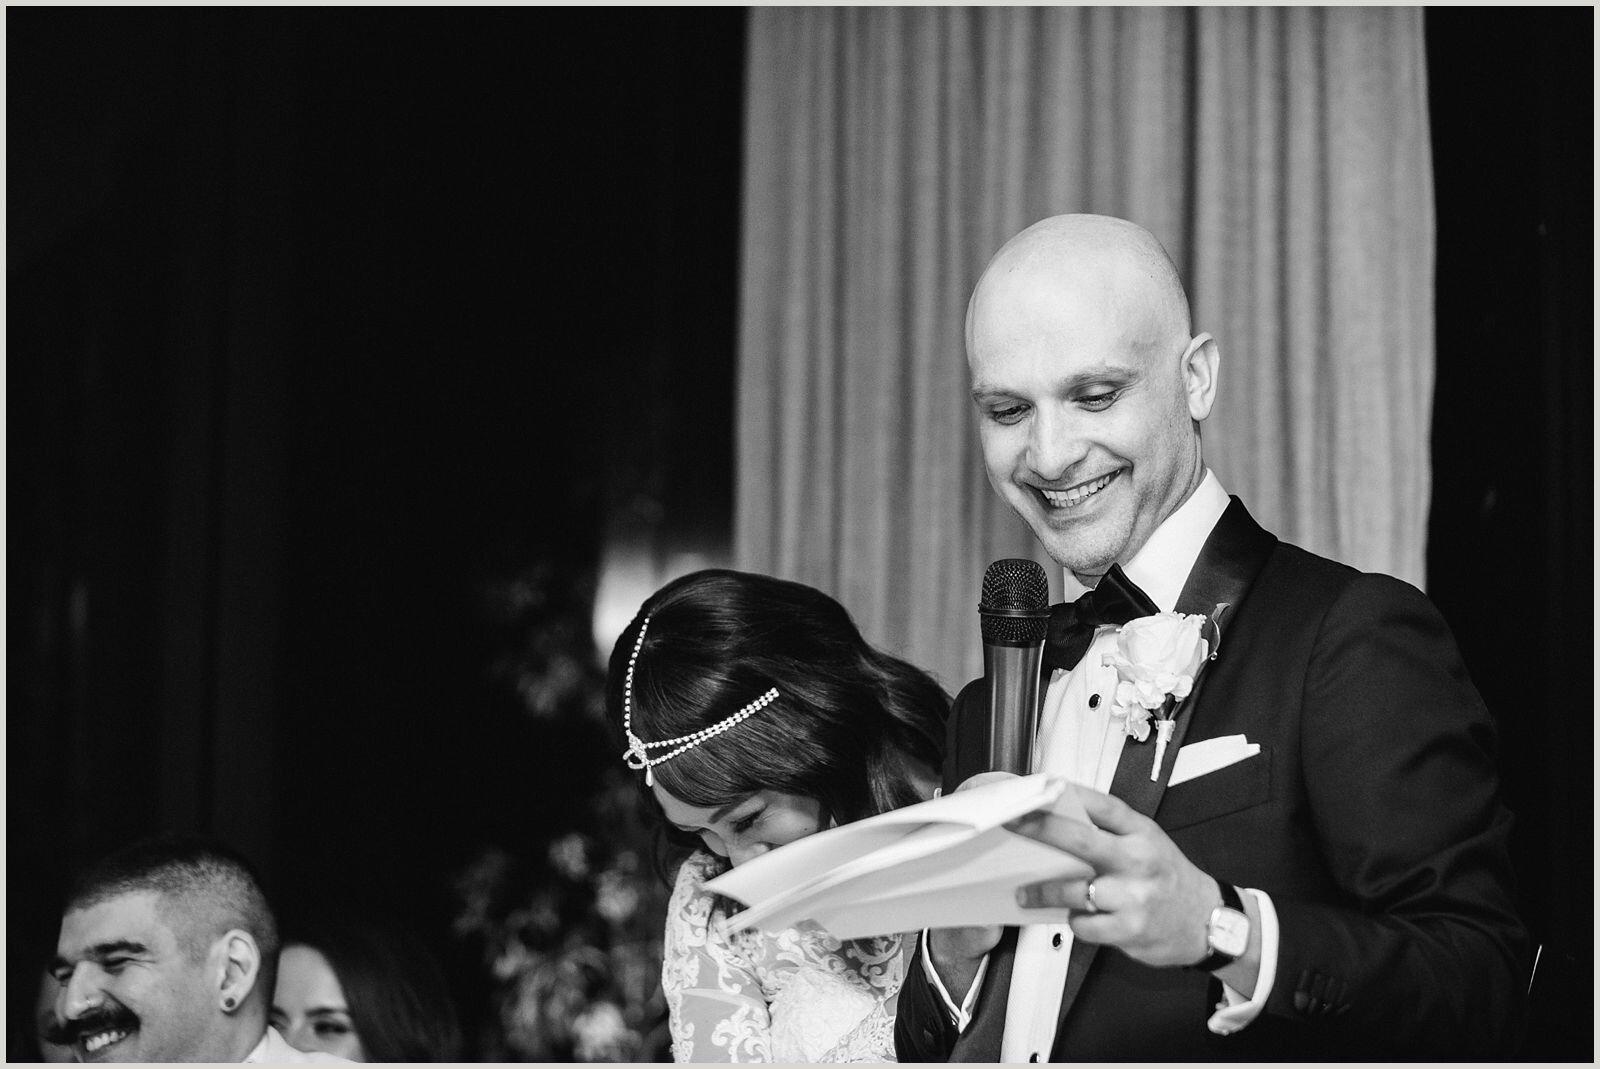 joseph_koprek_wedding_melbourne_the_prince_deck_0094.jpg